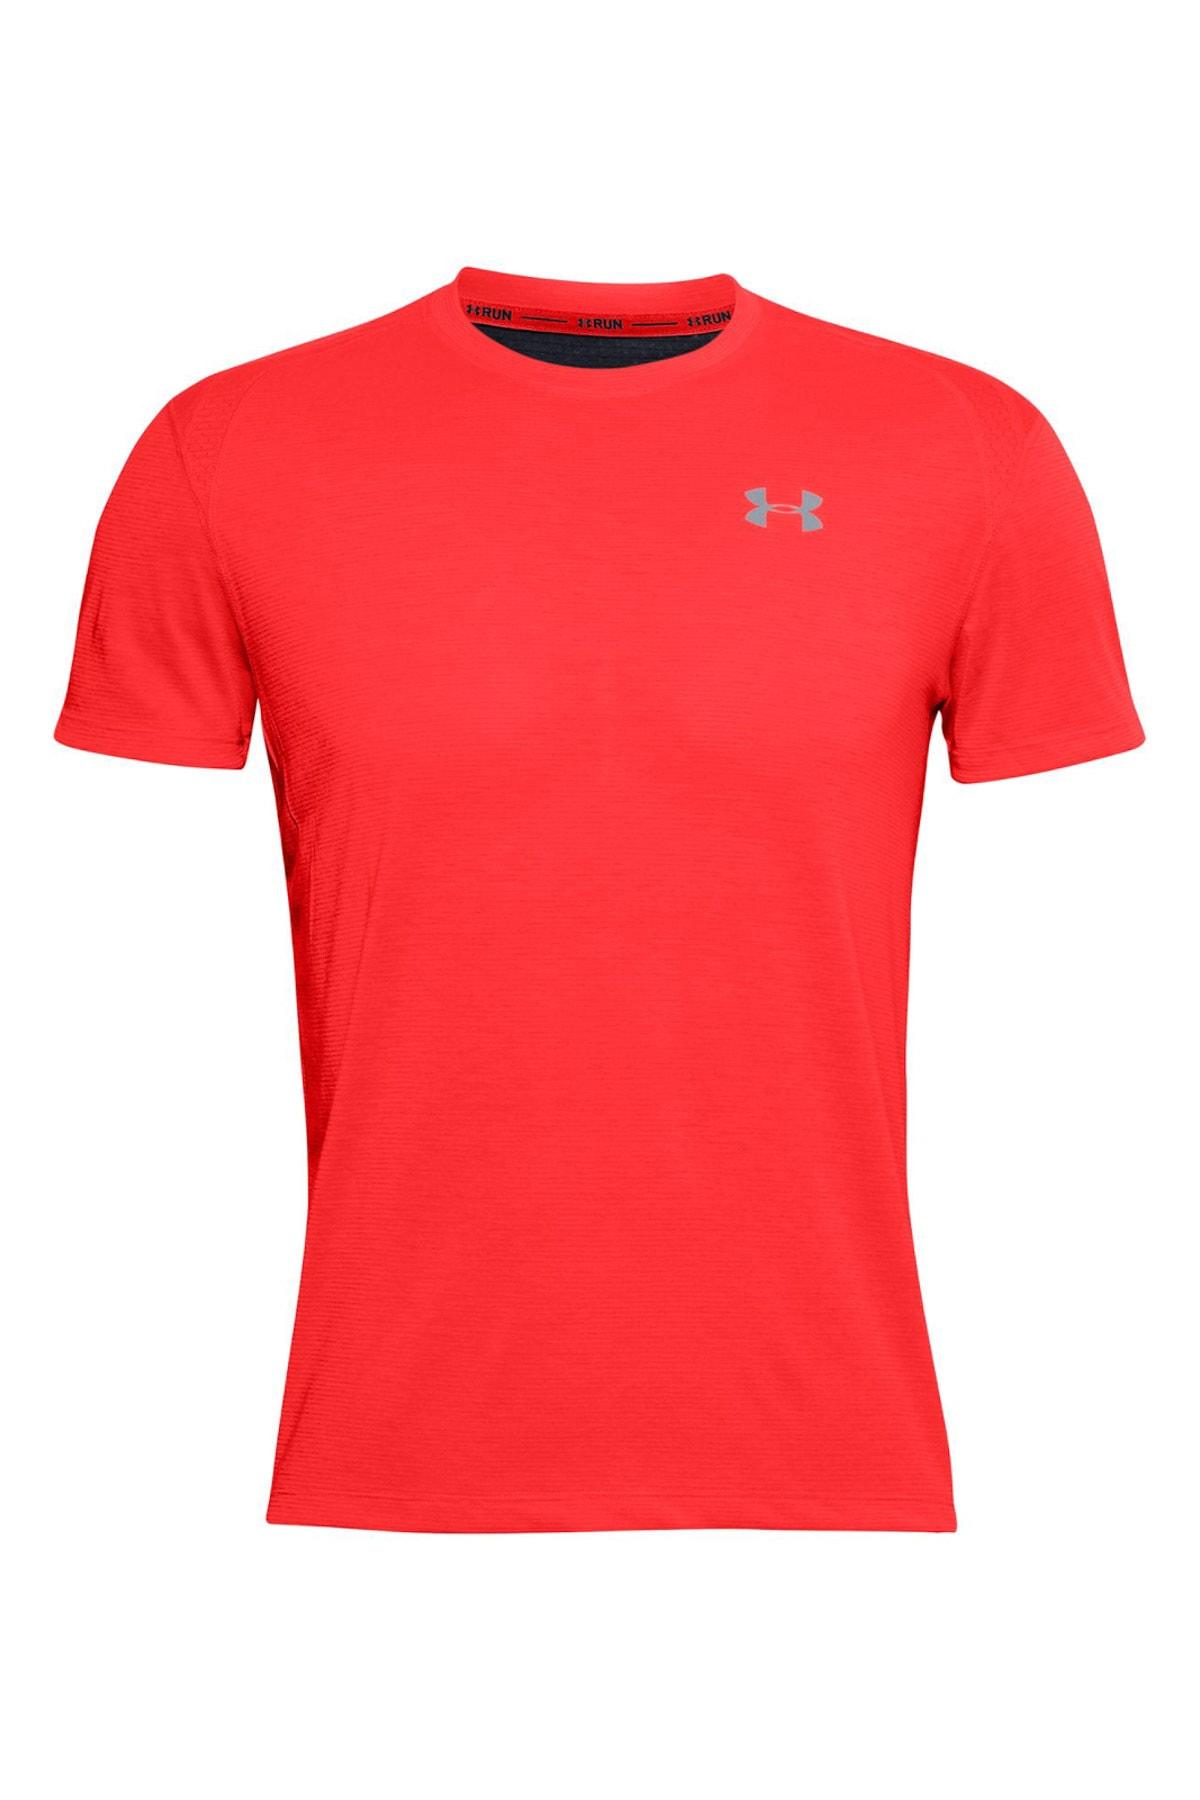 Under Armour Erkek Spor T-Shirt - Ua Streaker 2.0 Shortsleeve - 1326579-629 1